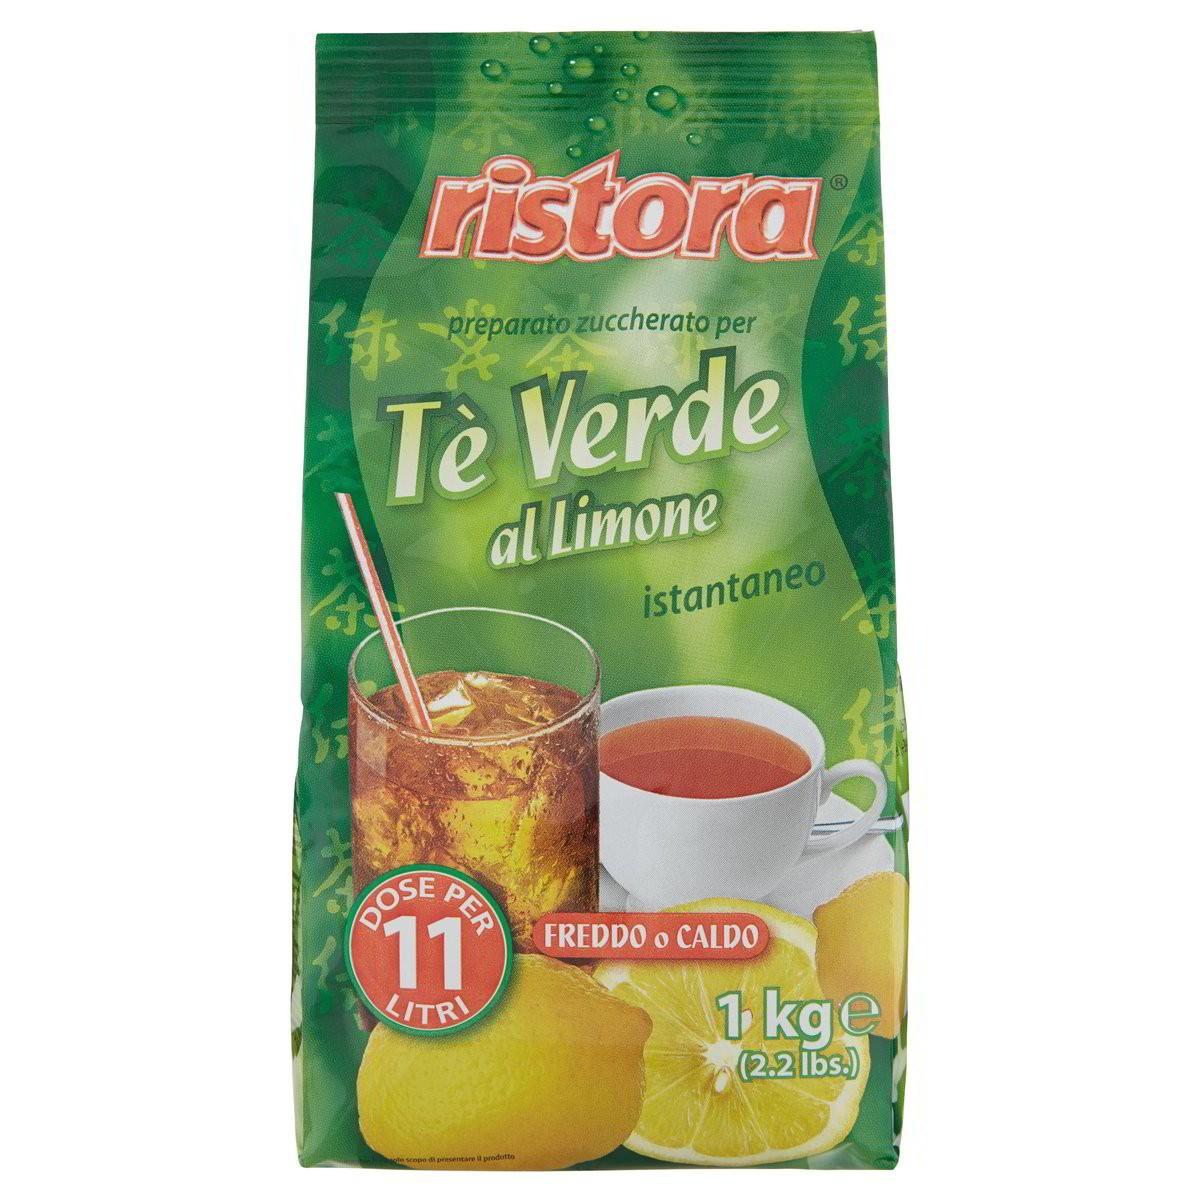 Ristora Tè Verde Istantaneo Limone